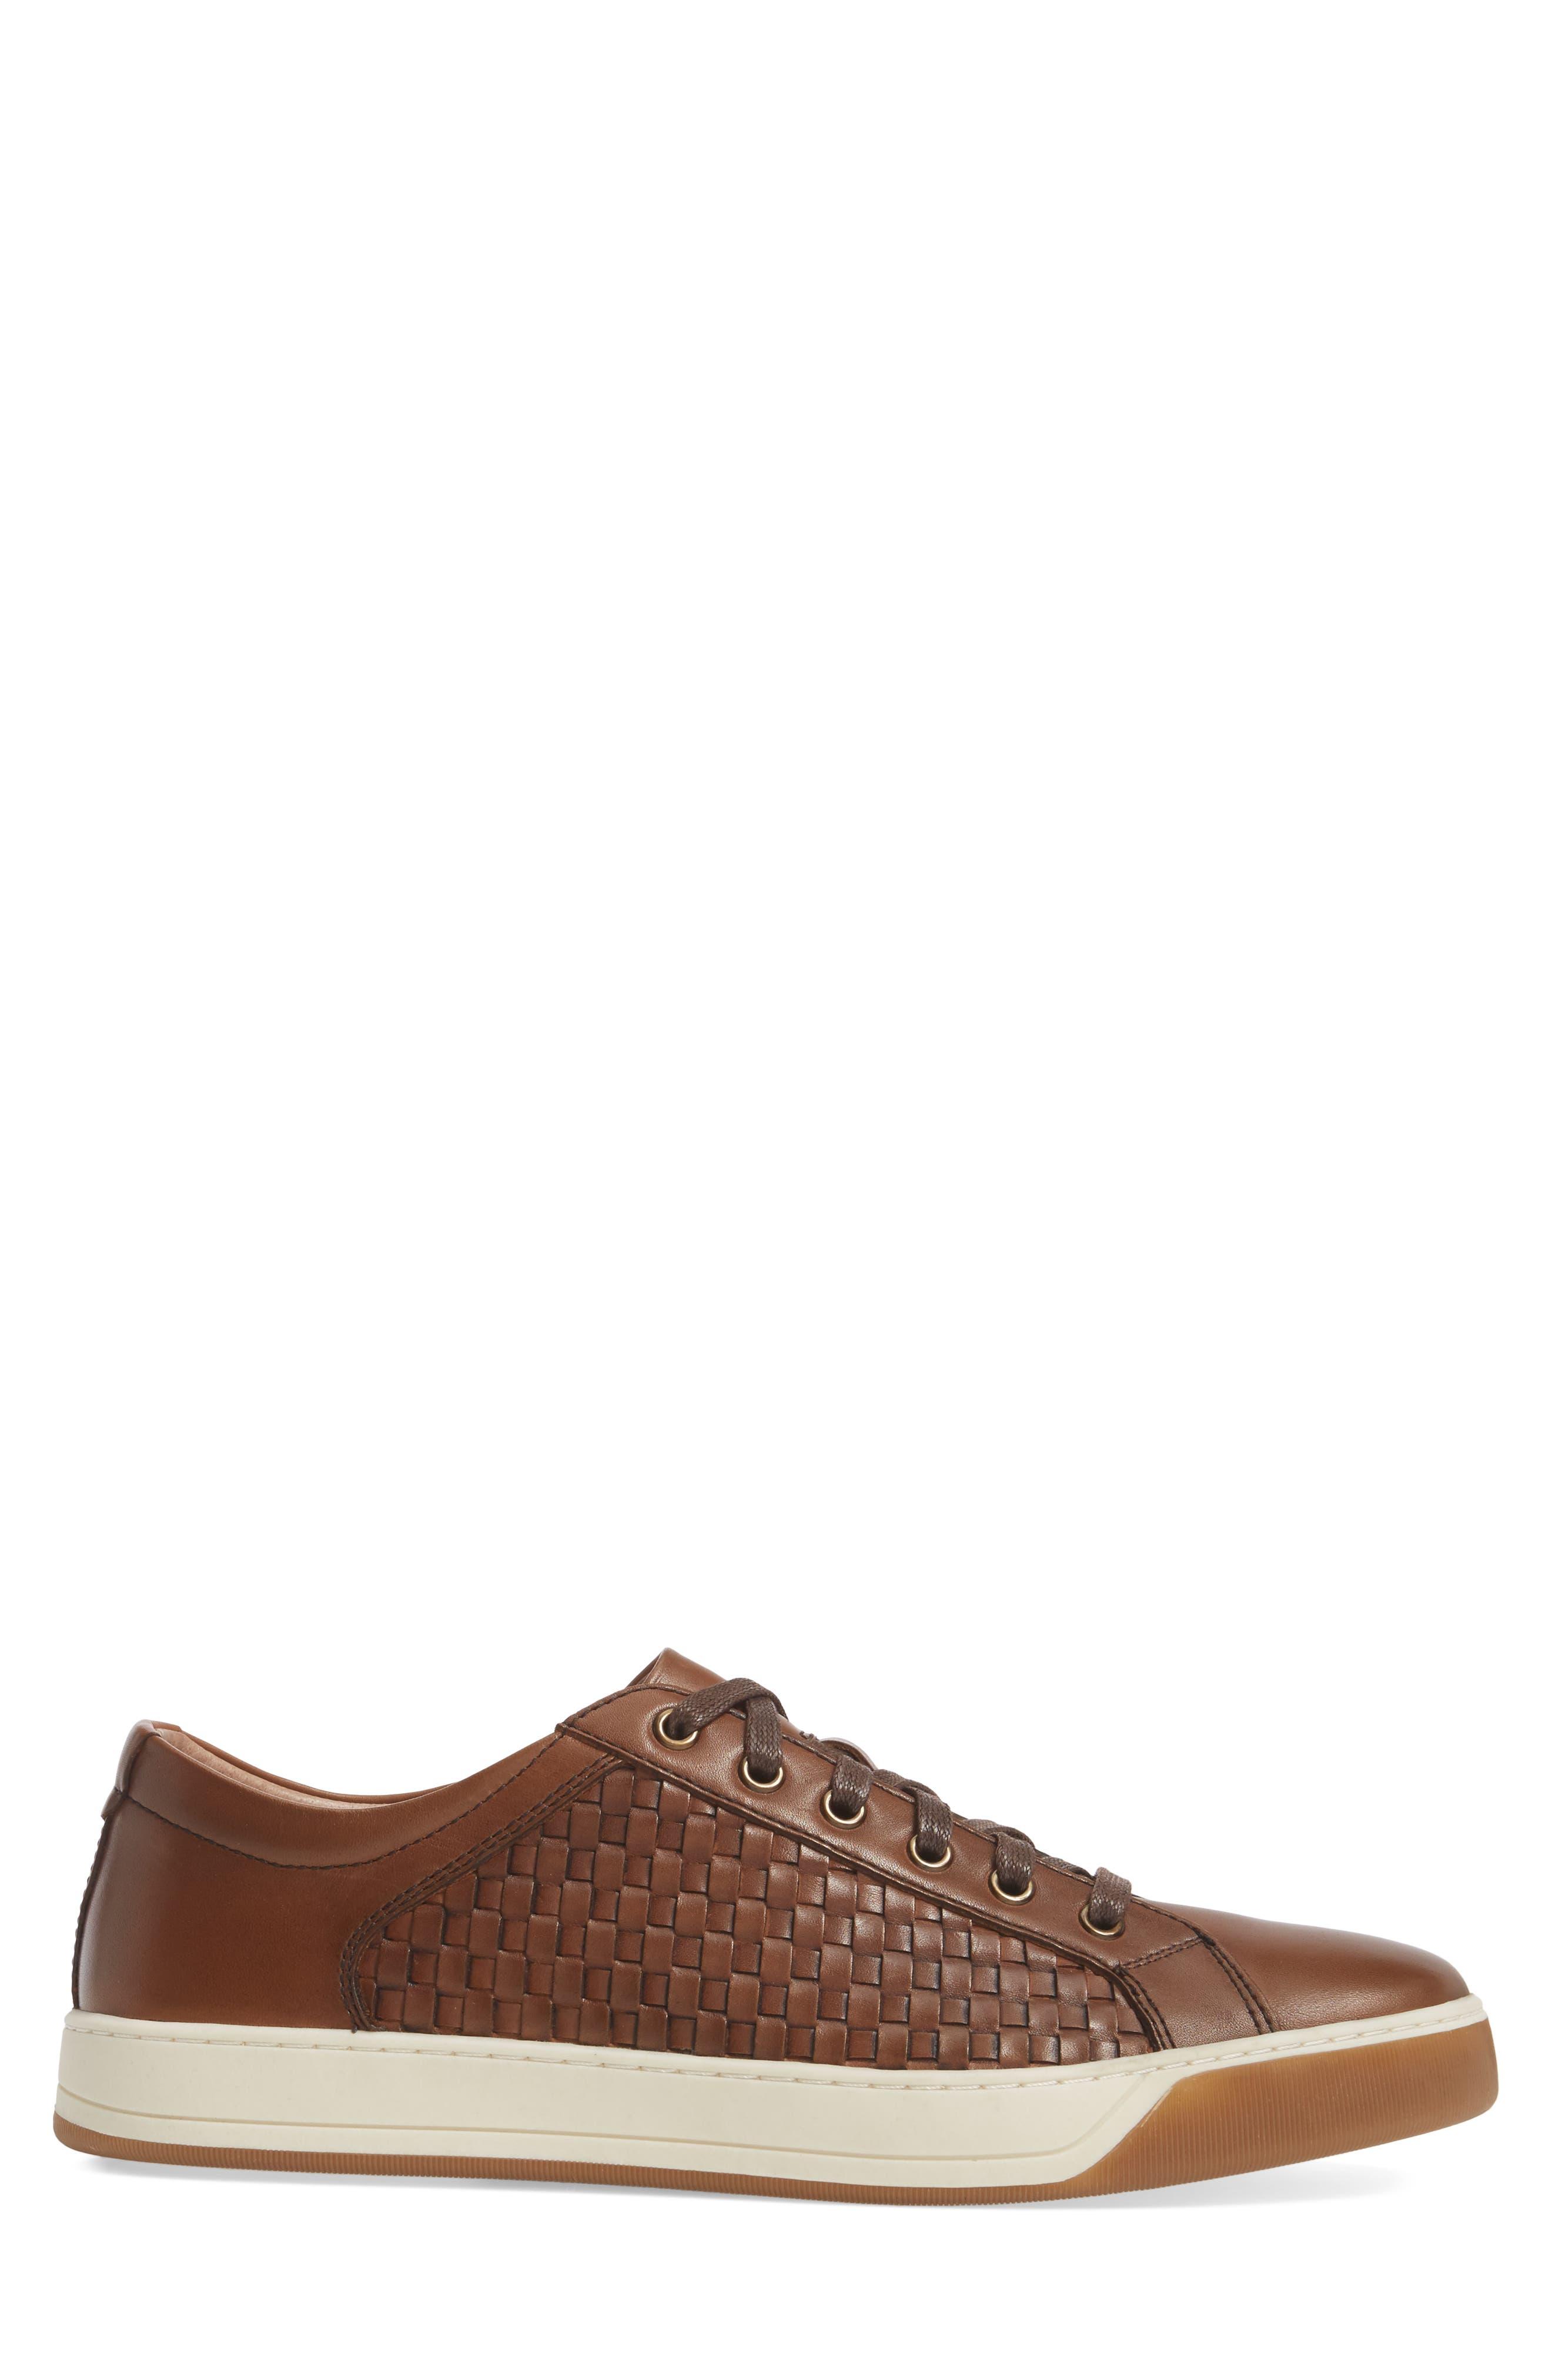 Allister Woven Low Top Sneaker,                             Alternate thumbnail 3, color,                             Brown